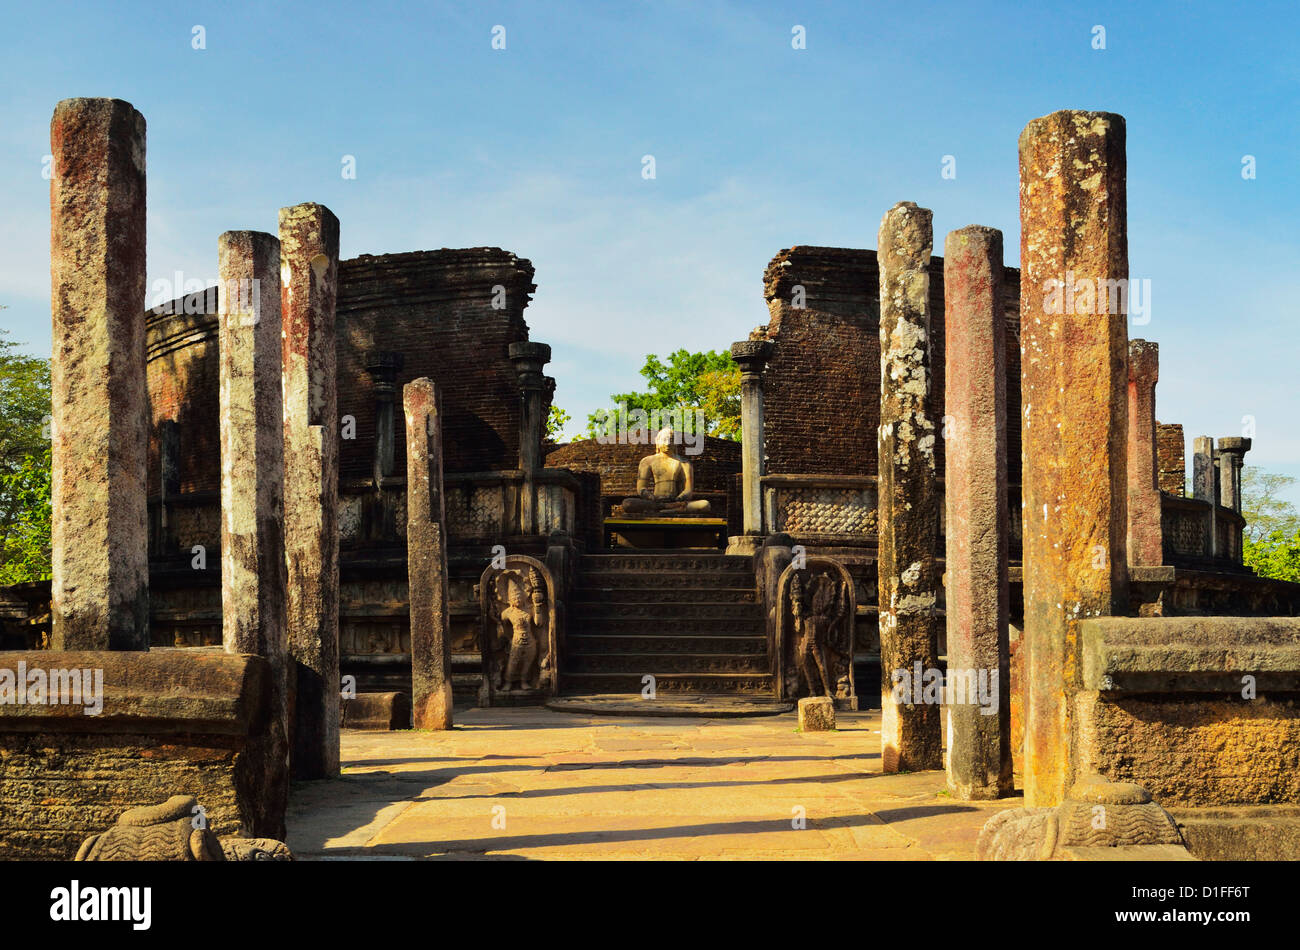 Ancient city of Polonnaruwa, UNESCO World Heritage Site, Polonnaruwa, Sri Lanka, Asia - Stock Image